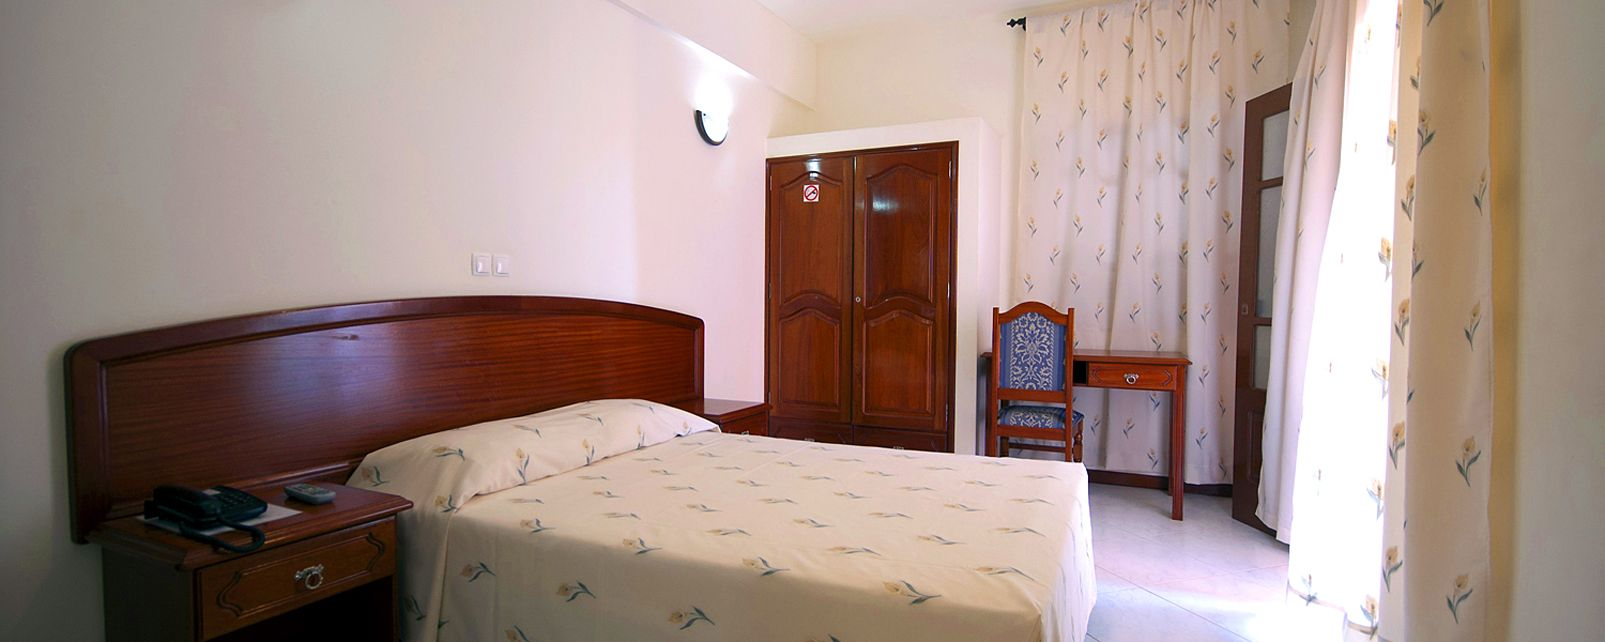 Hôtel Residencial Beleza